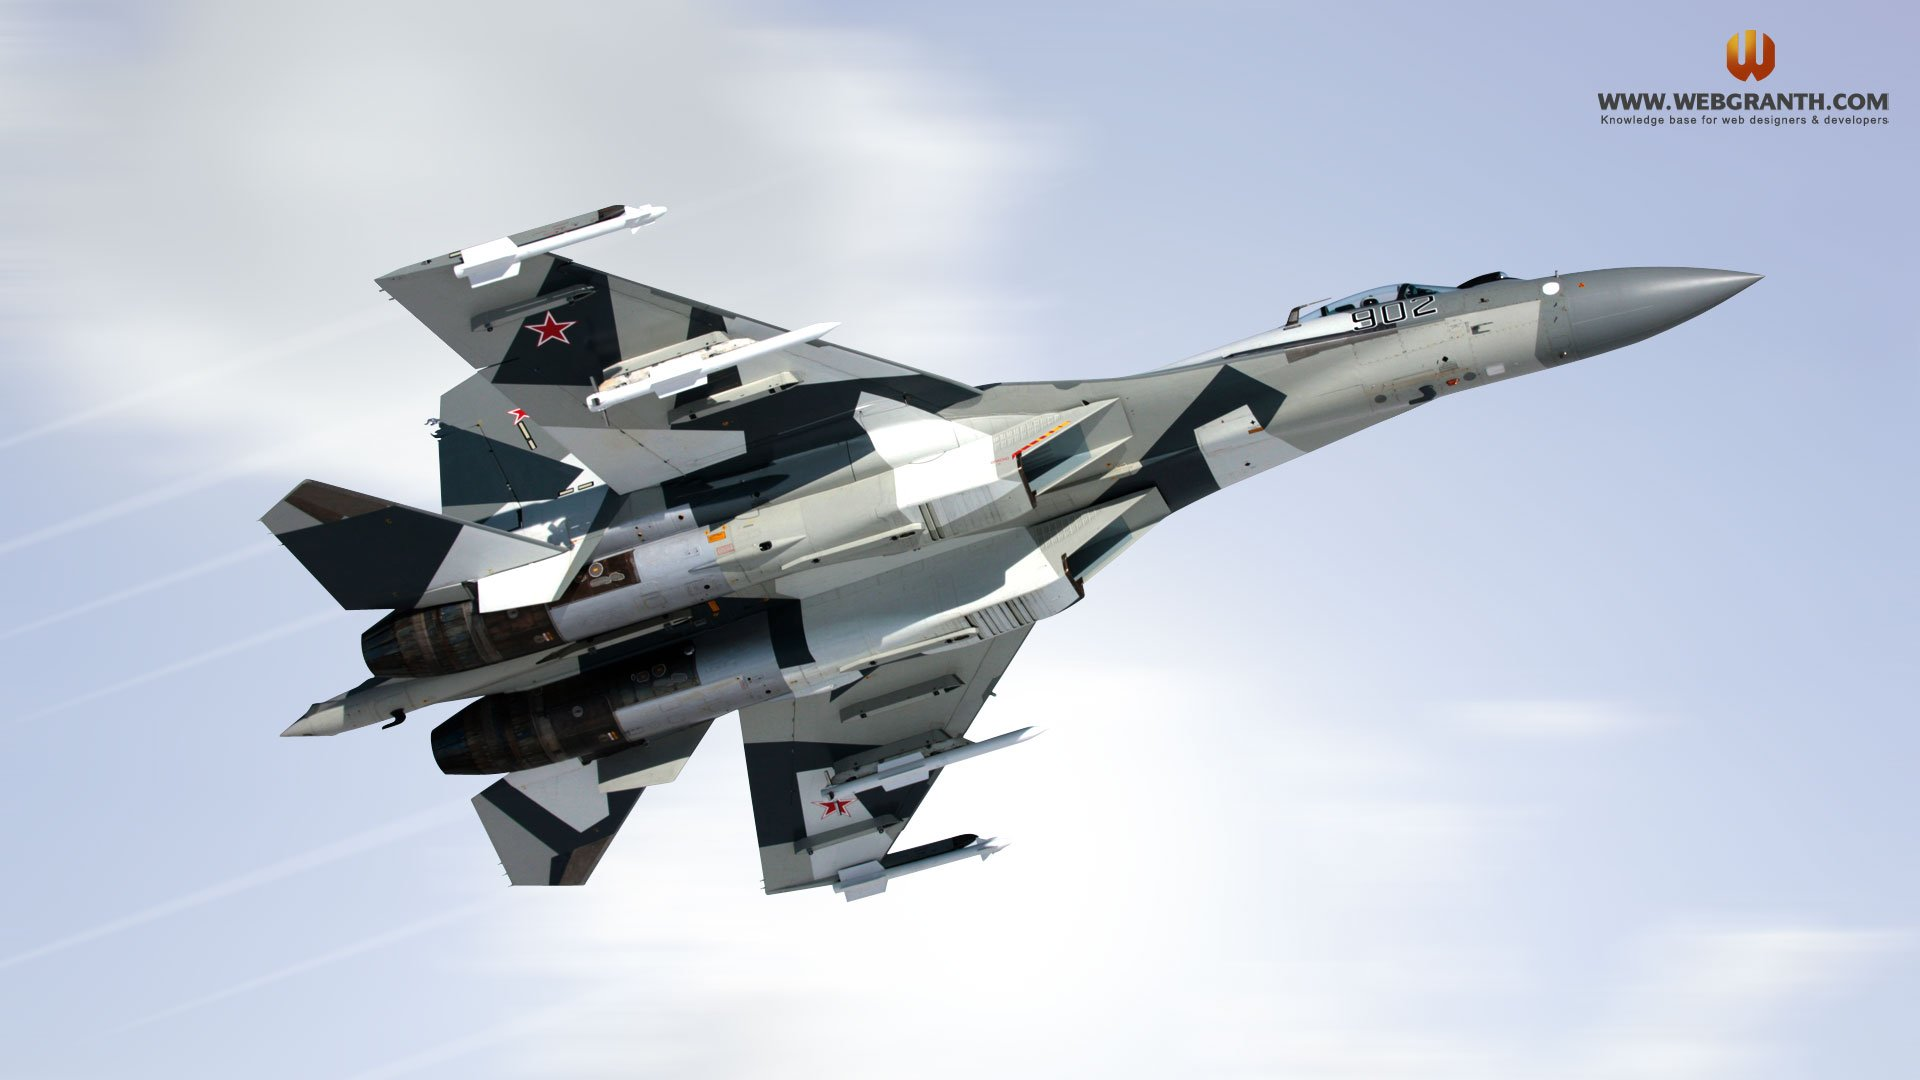 HD Fighter Jet Wallpaper   Webgranth 2015 1920x1080